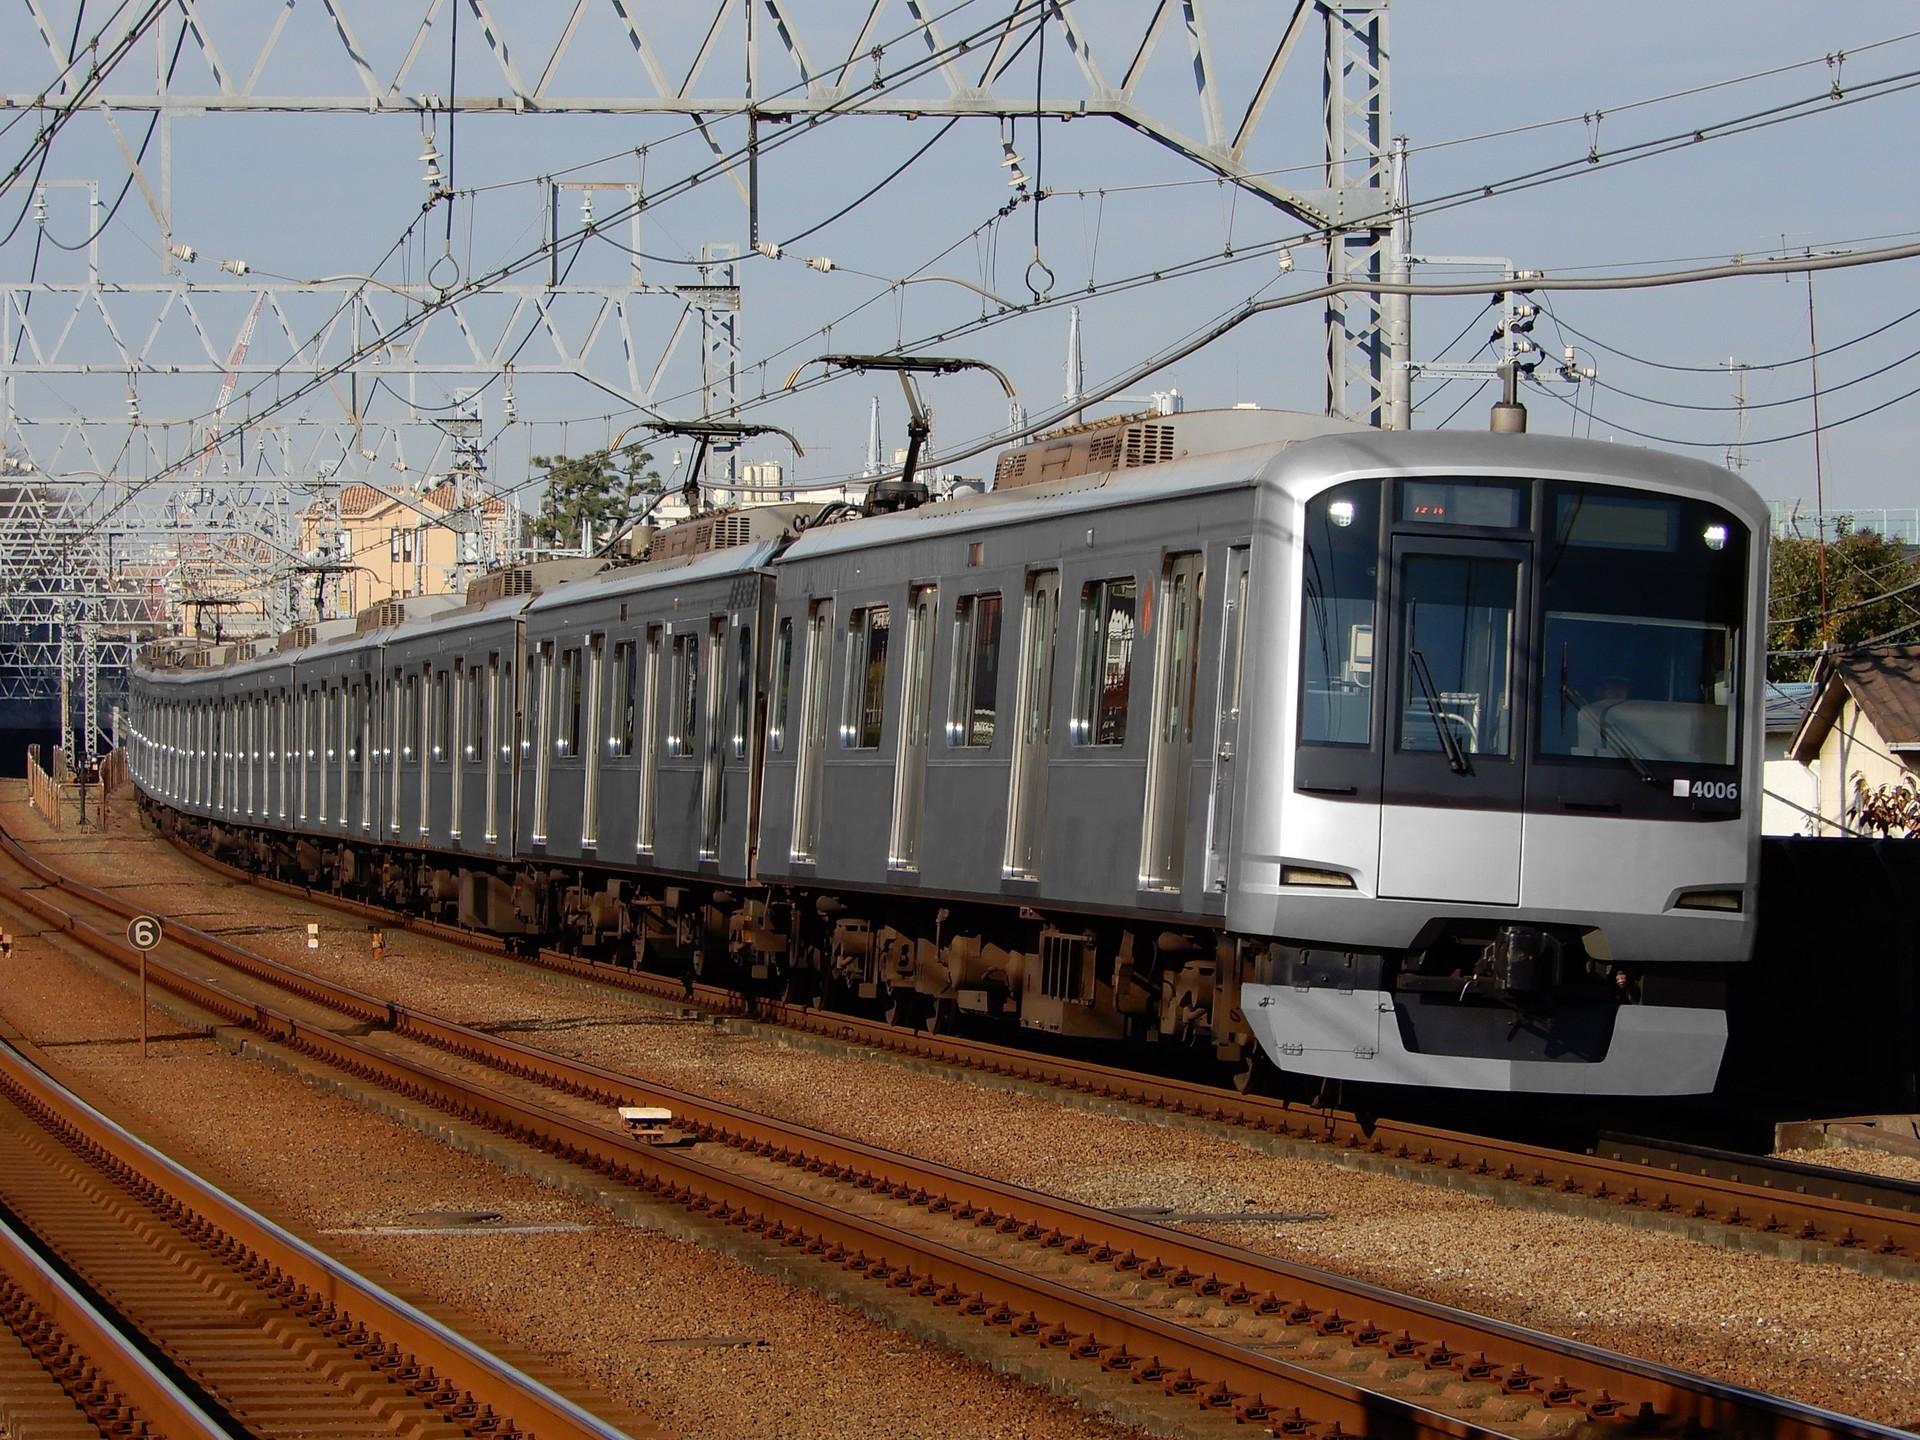 東急電鉄 5050系の色変え用素体